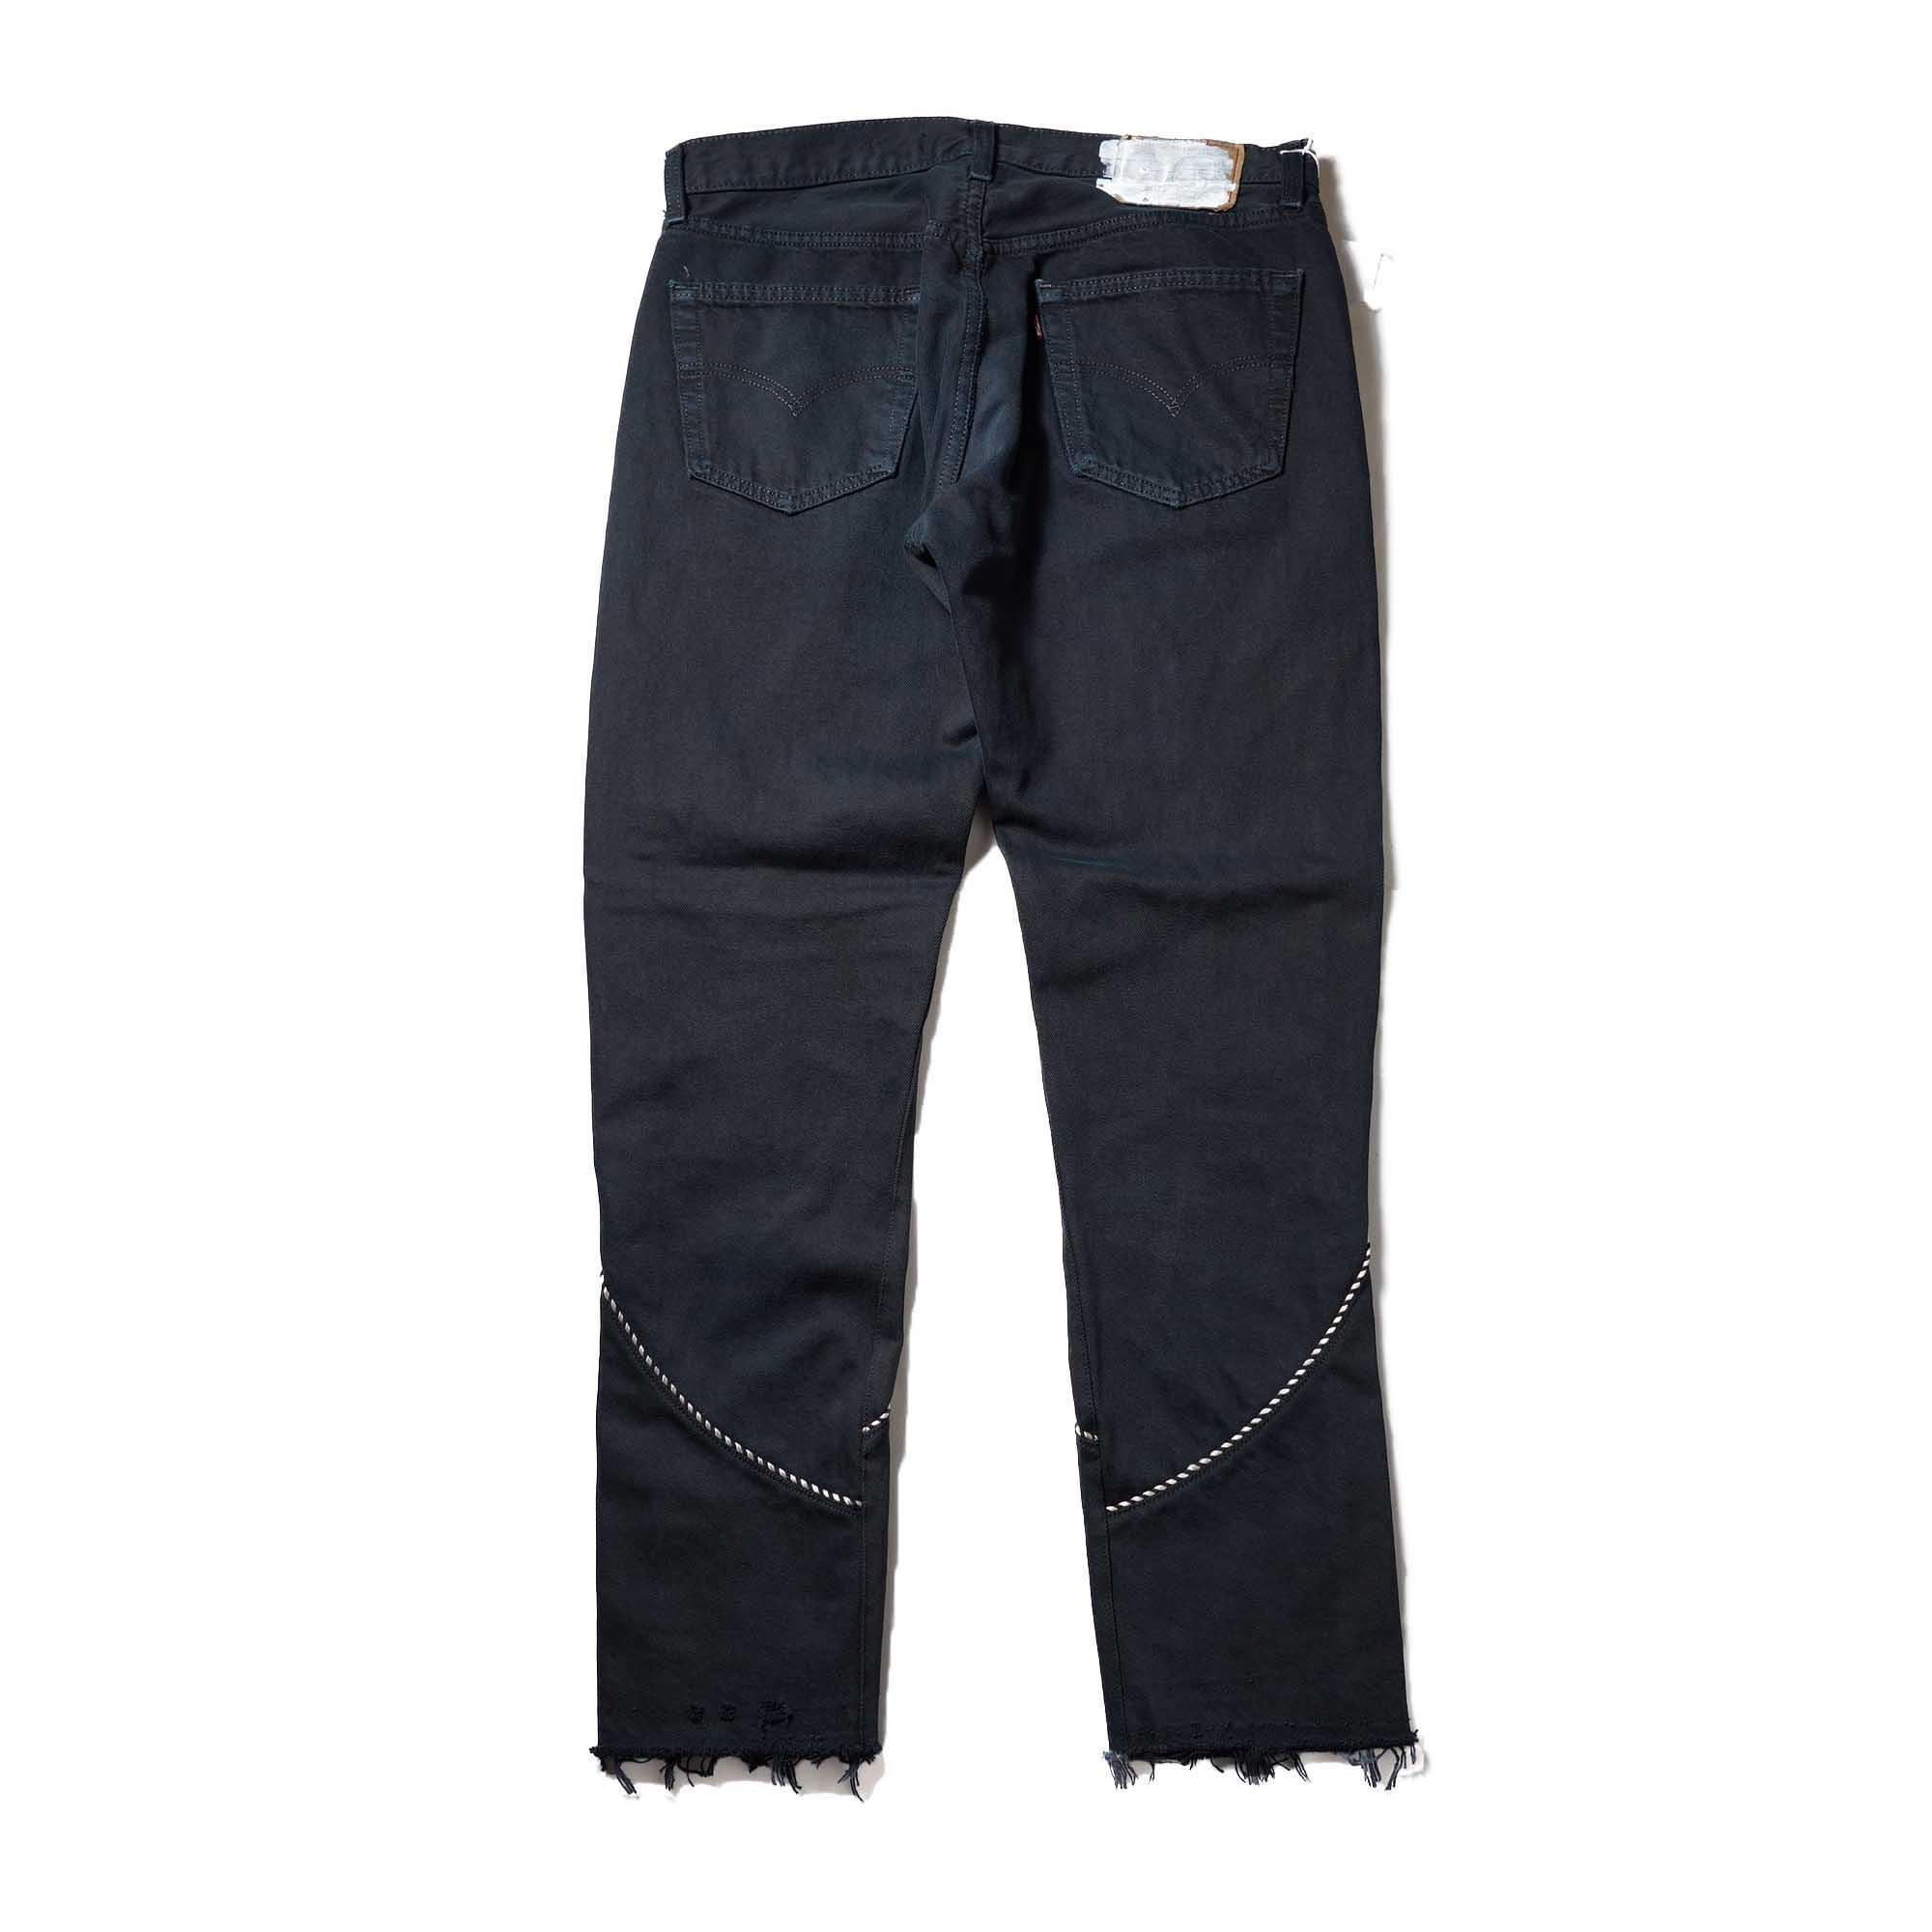 OLD PARK / Western Jeans2 Black (Lsize-A)背面